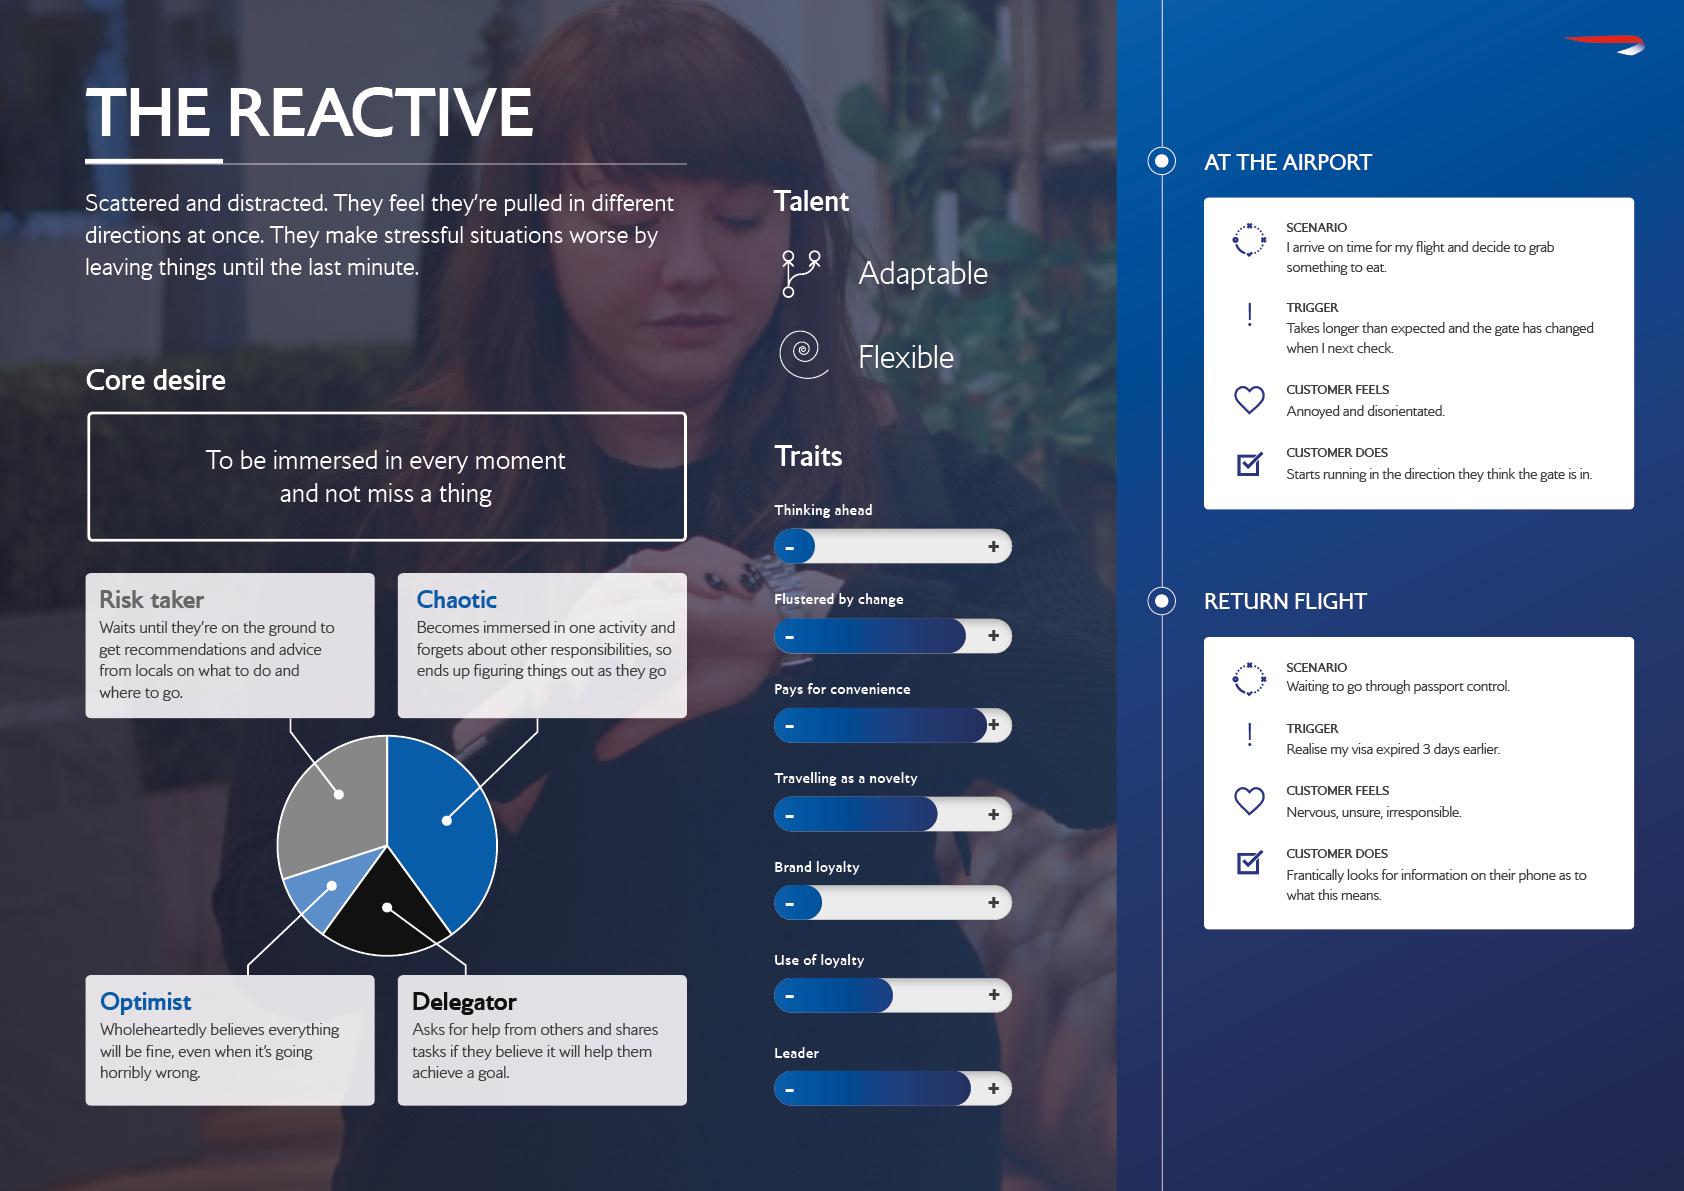 persona-the reactive.jpg